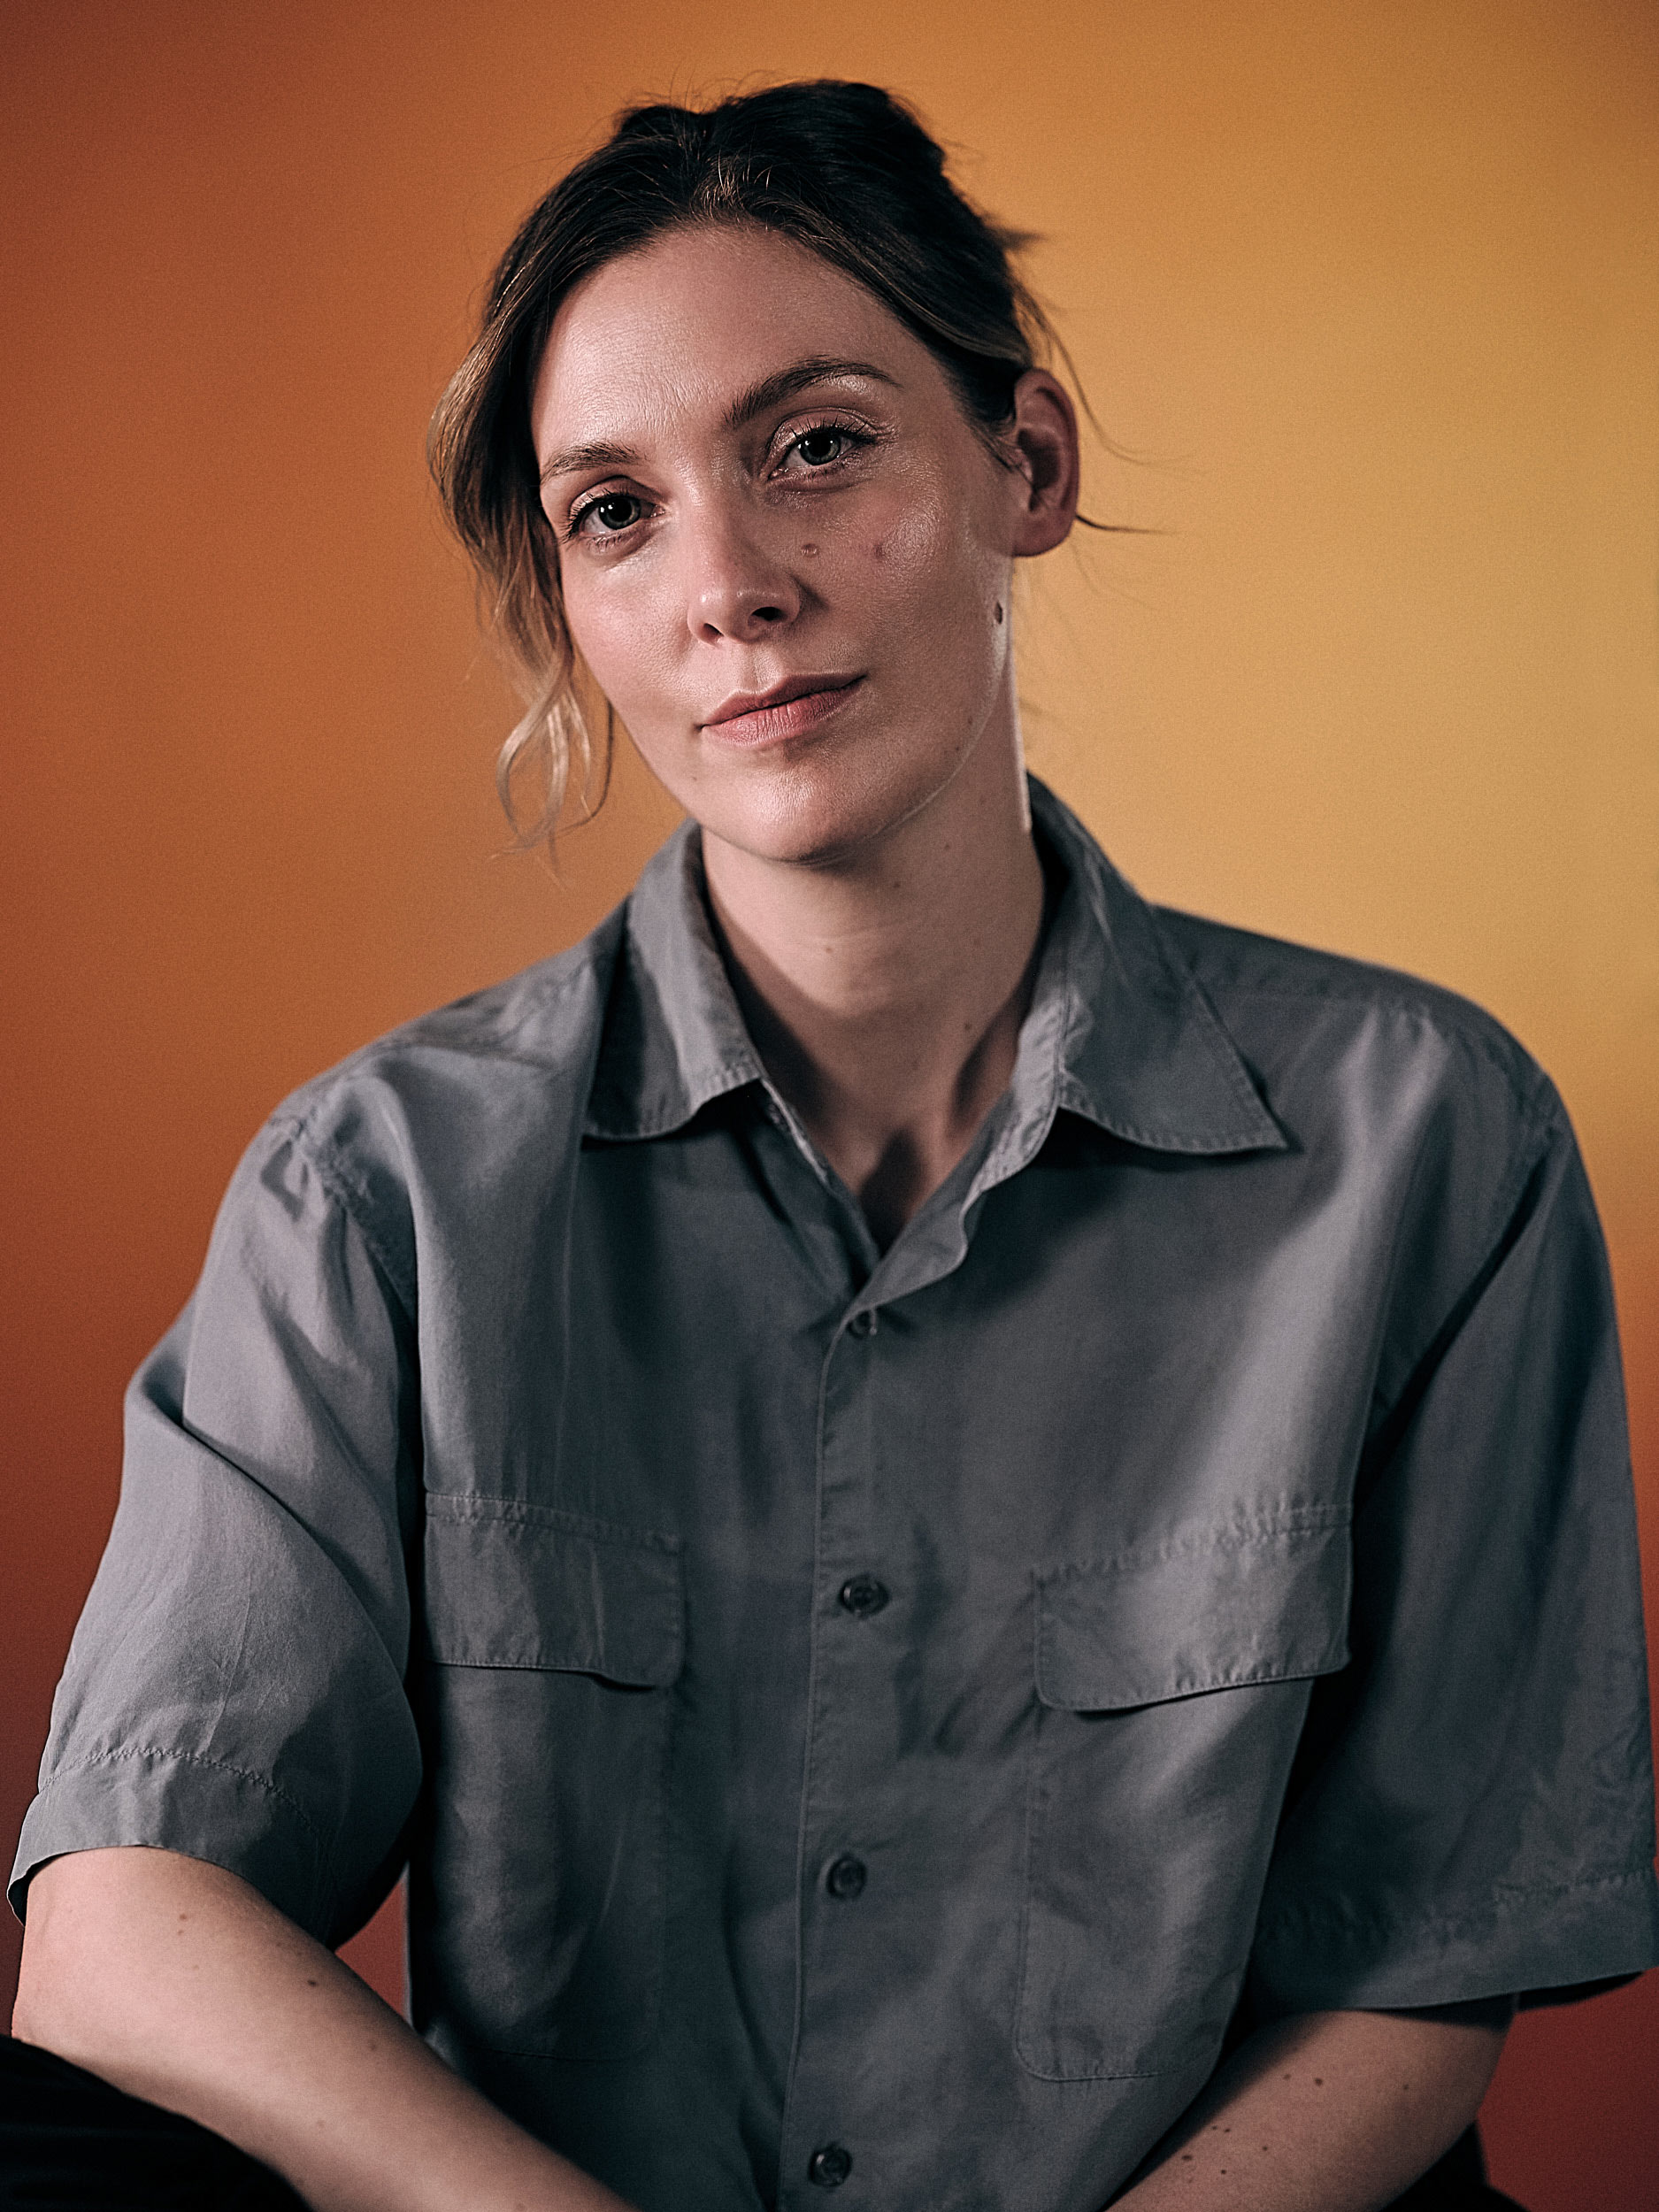 Tina Tenkmann - Meet the Antagonist Editorial Team - 2021